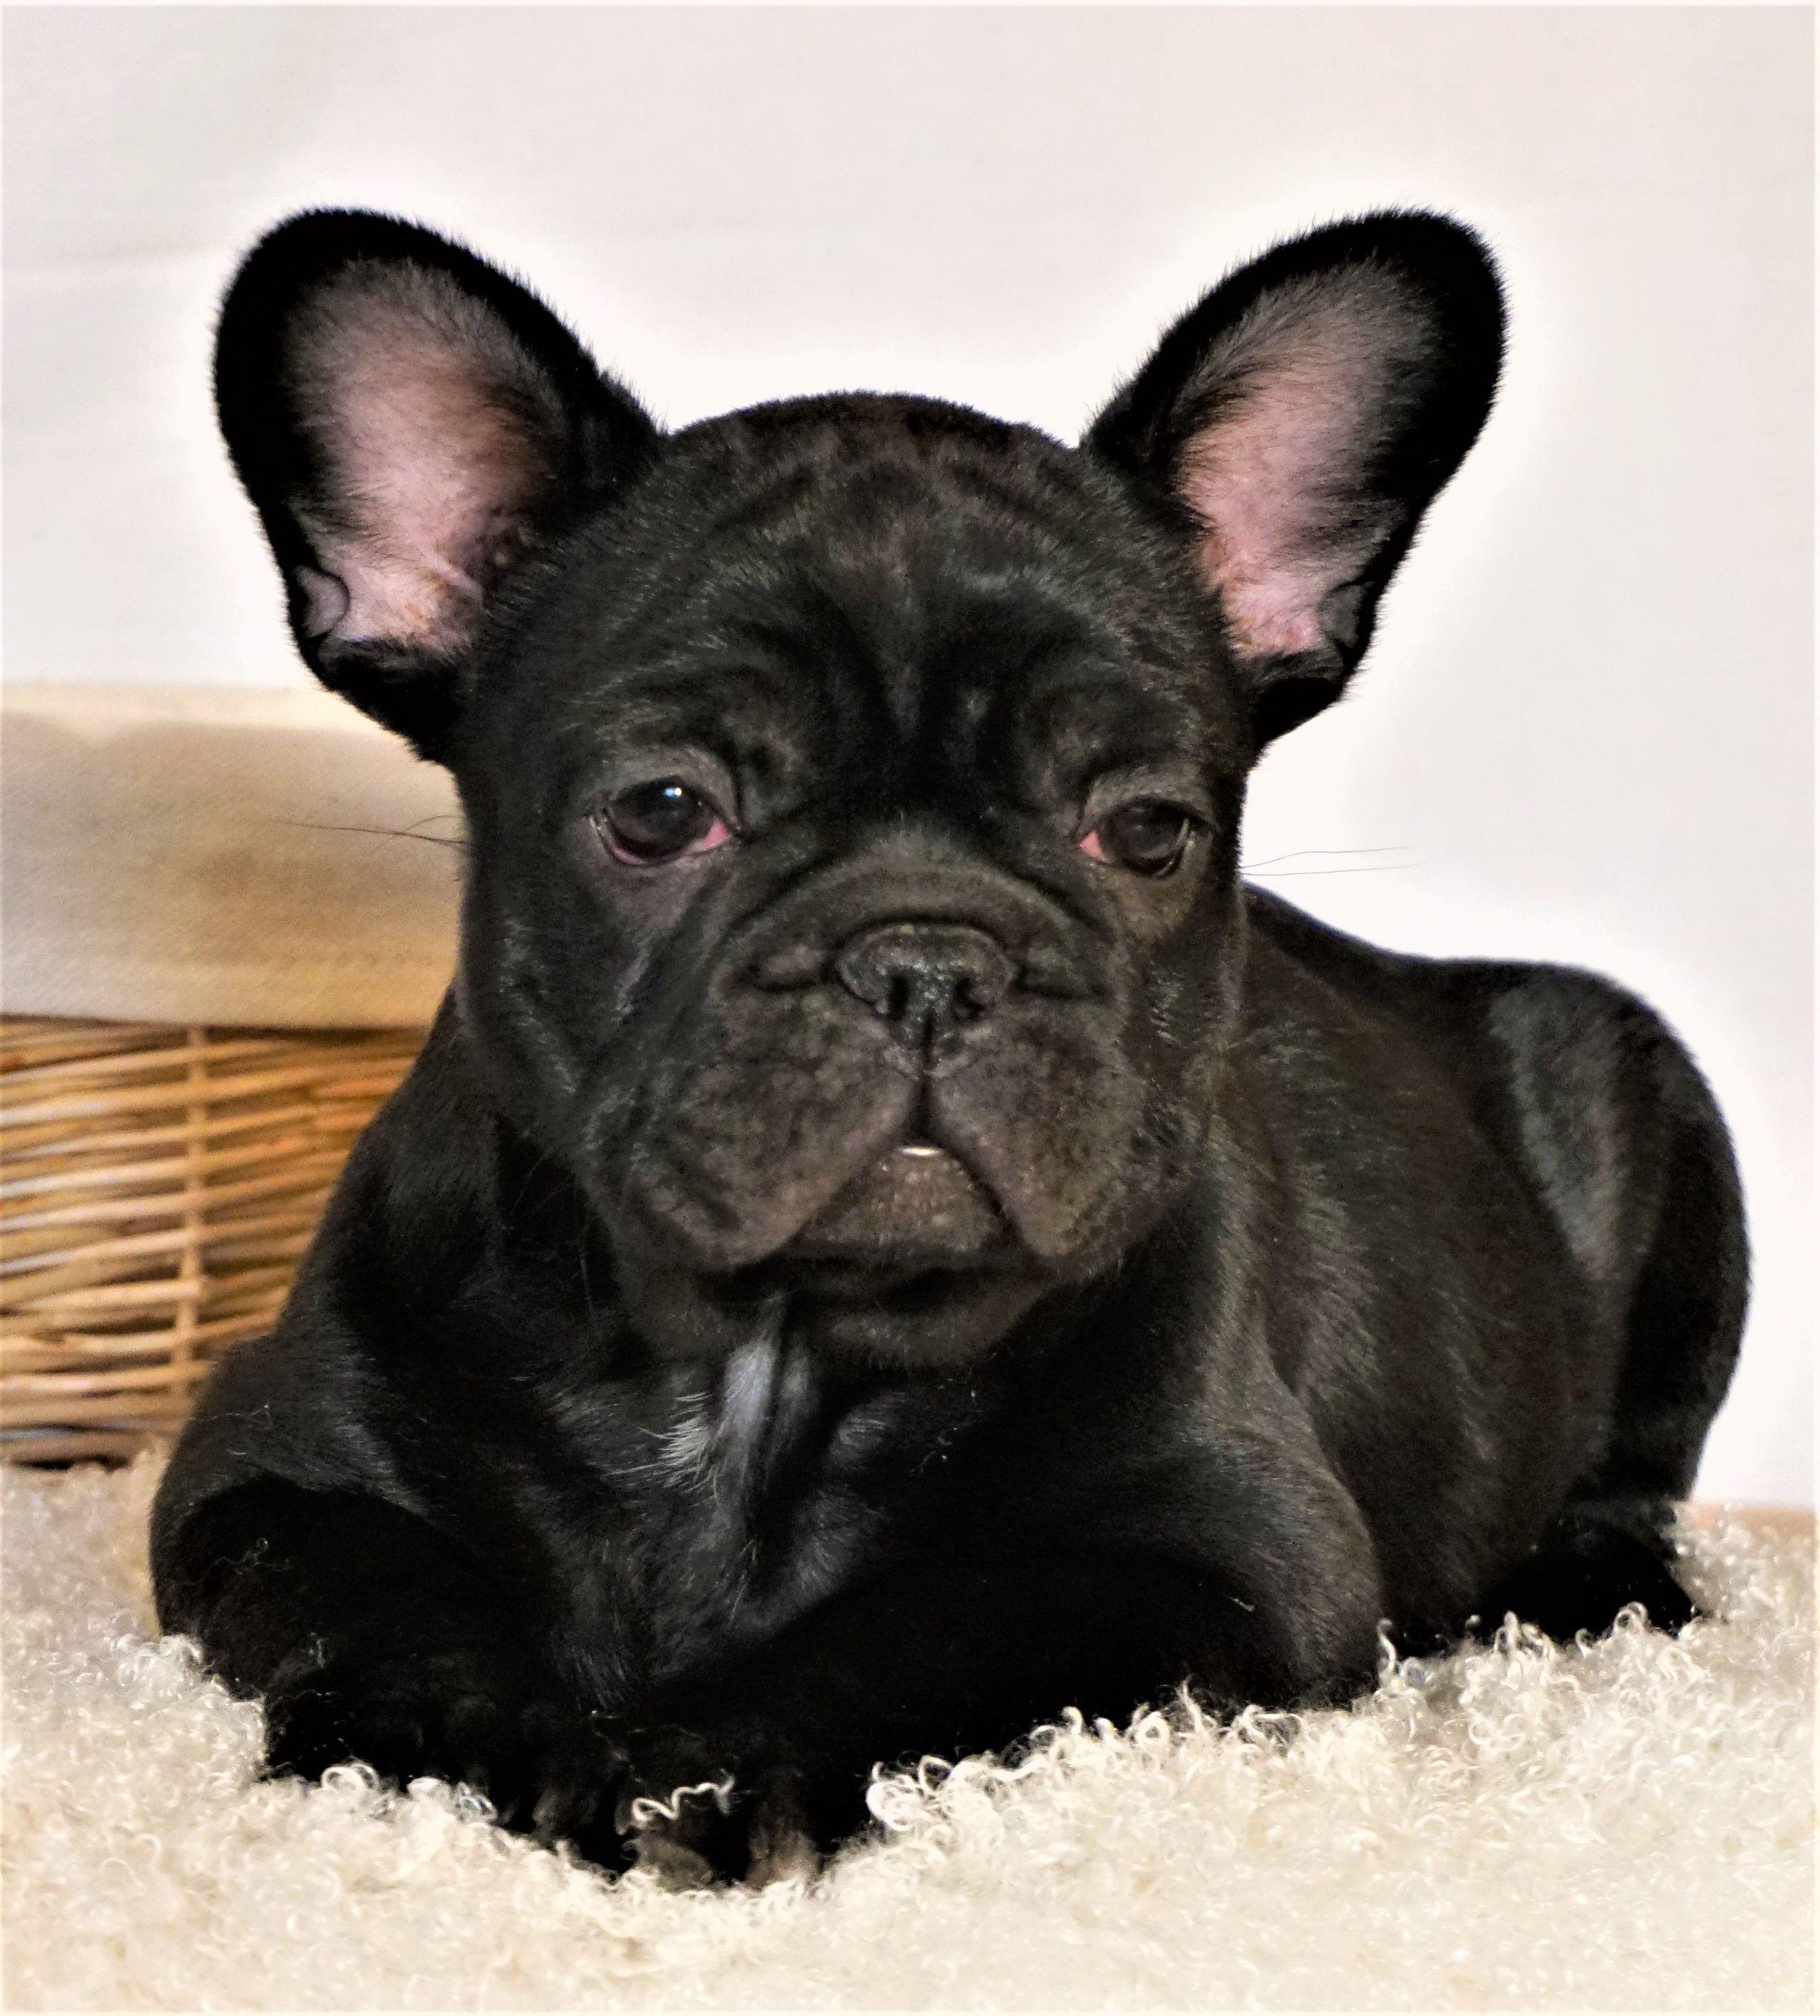 Blacky the French Bulldog waiting you. French bulldog